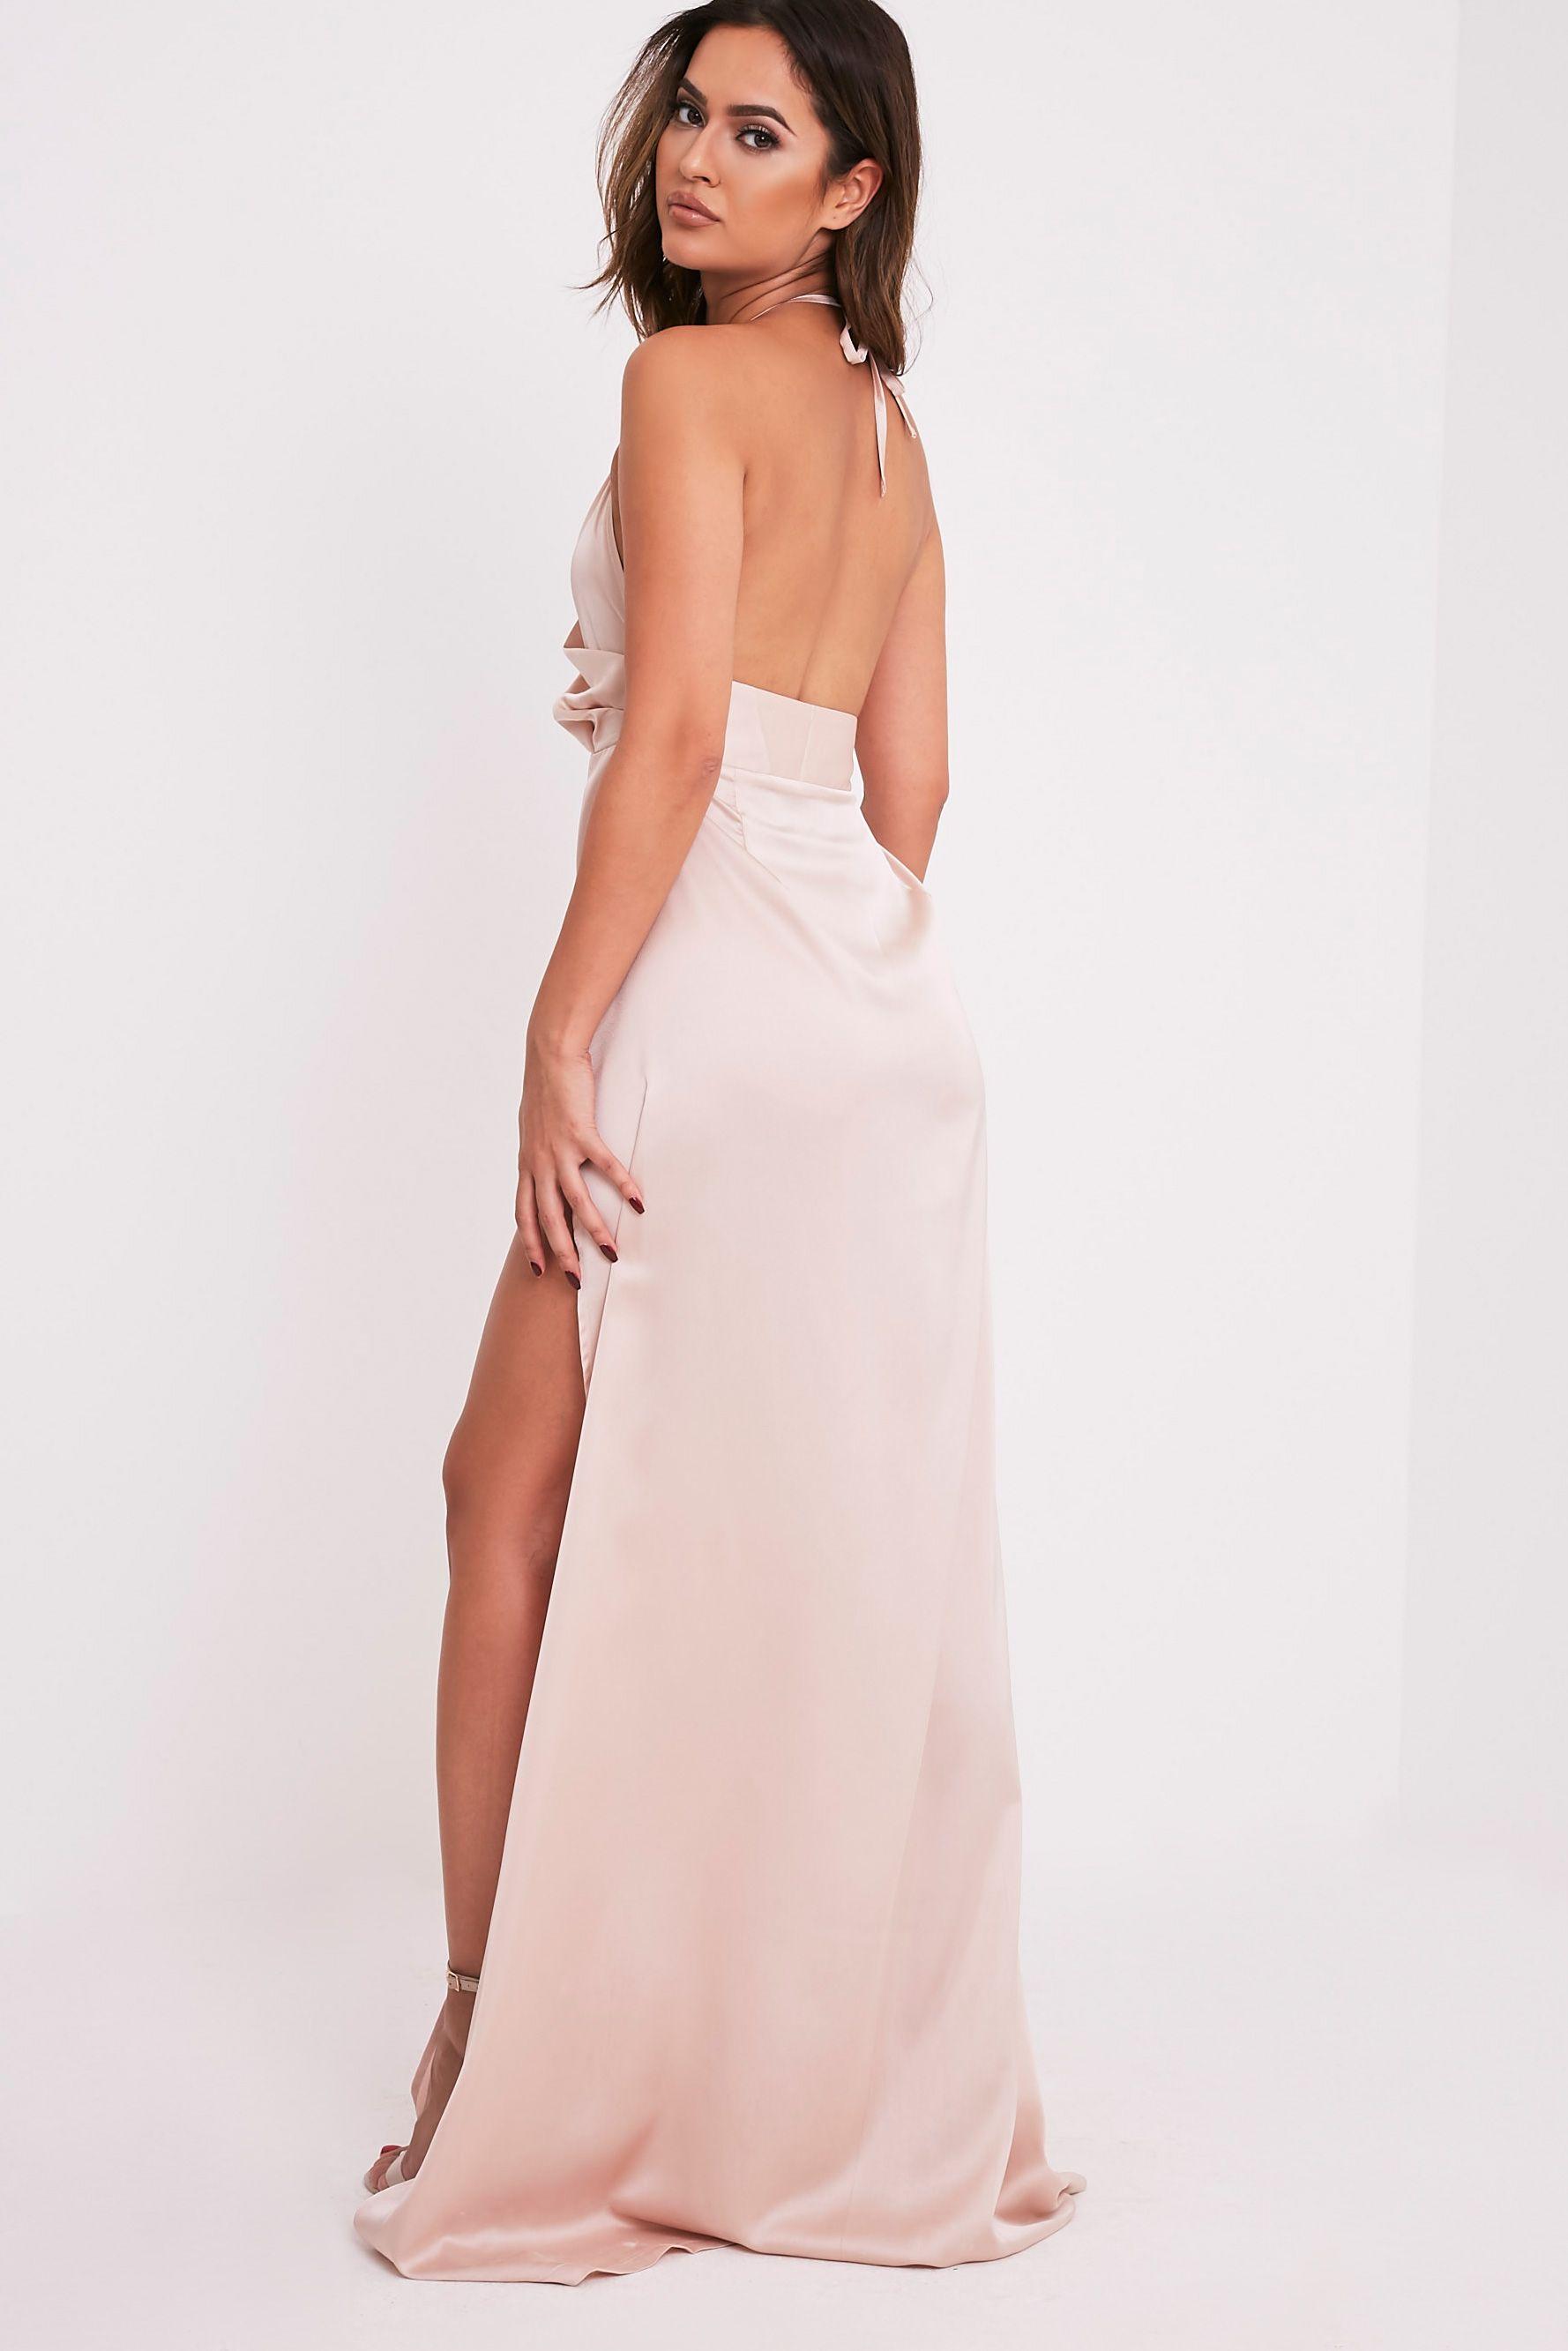 b5601c421fbcbe Lucie Champagne Silky Plunge Extreme Split Maxi Dress Image 4